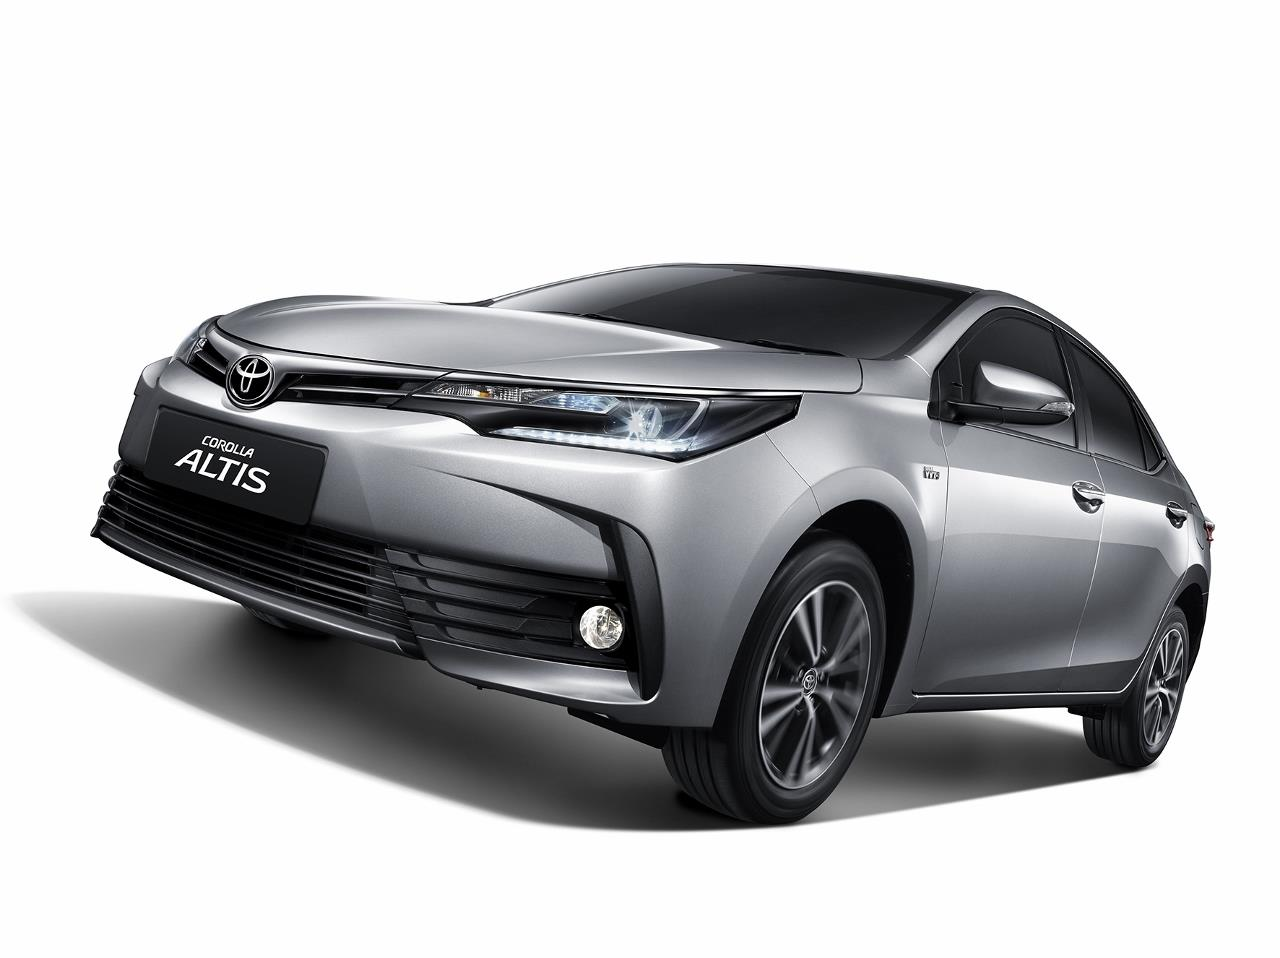 2017 Toyota Corolla Altis facelift photo gallery